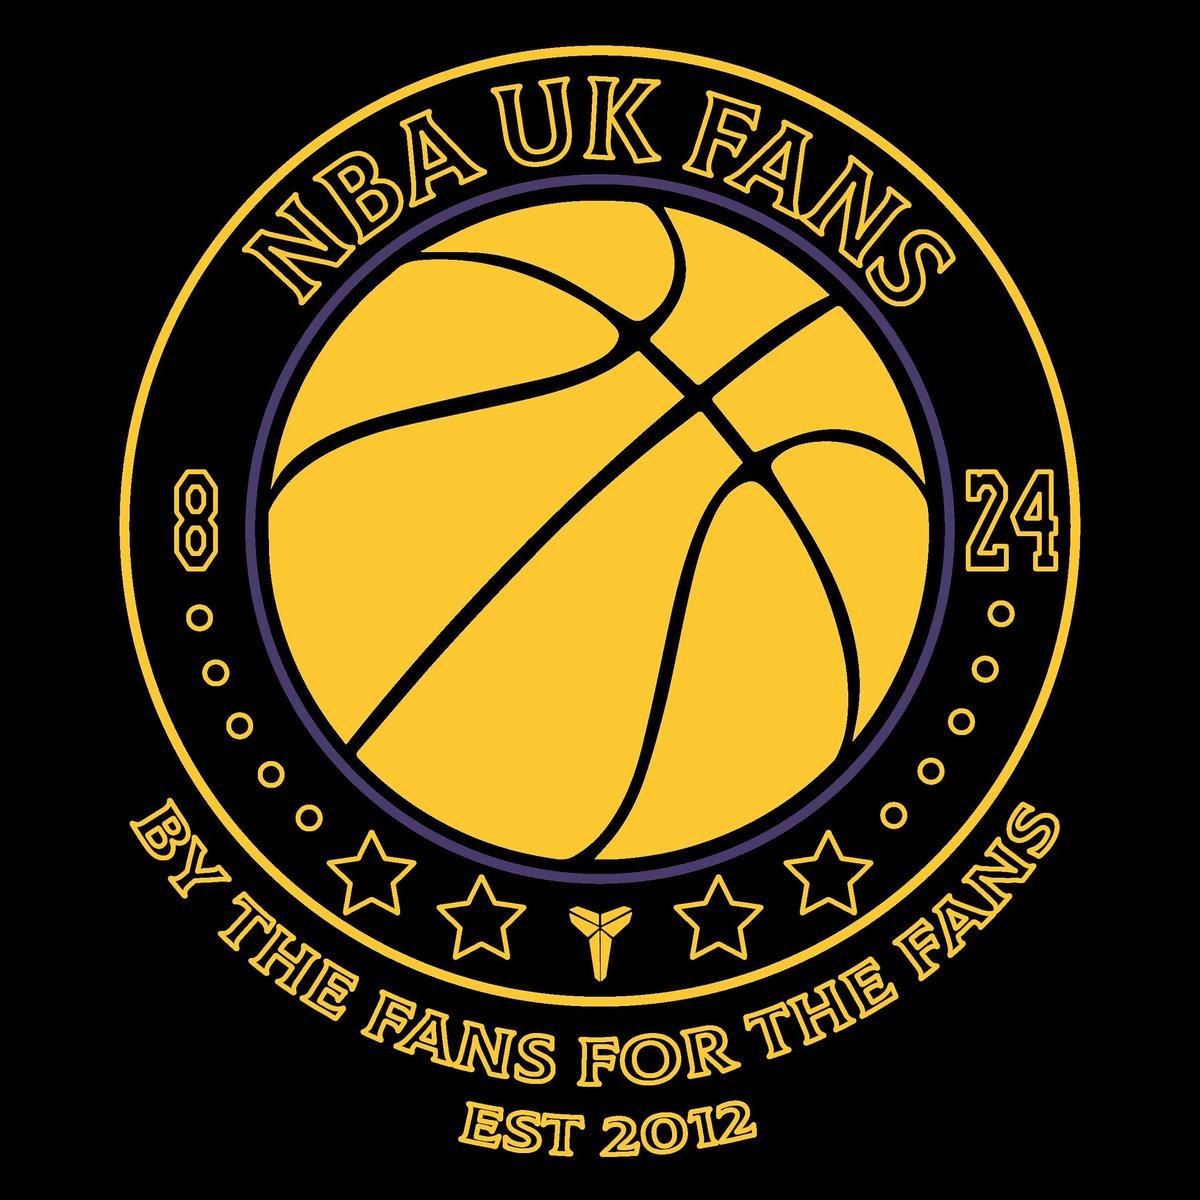 One Year 🐍💜💛  #MambaForever #NBA #KobeBryant #KobeBean #Kobe #Bean #Lakers #BlackMamba #Legend #Hero #Icon #Giant #RIPKobe